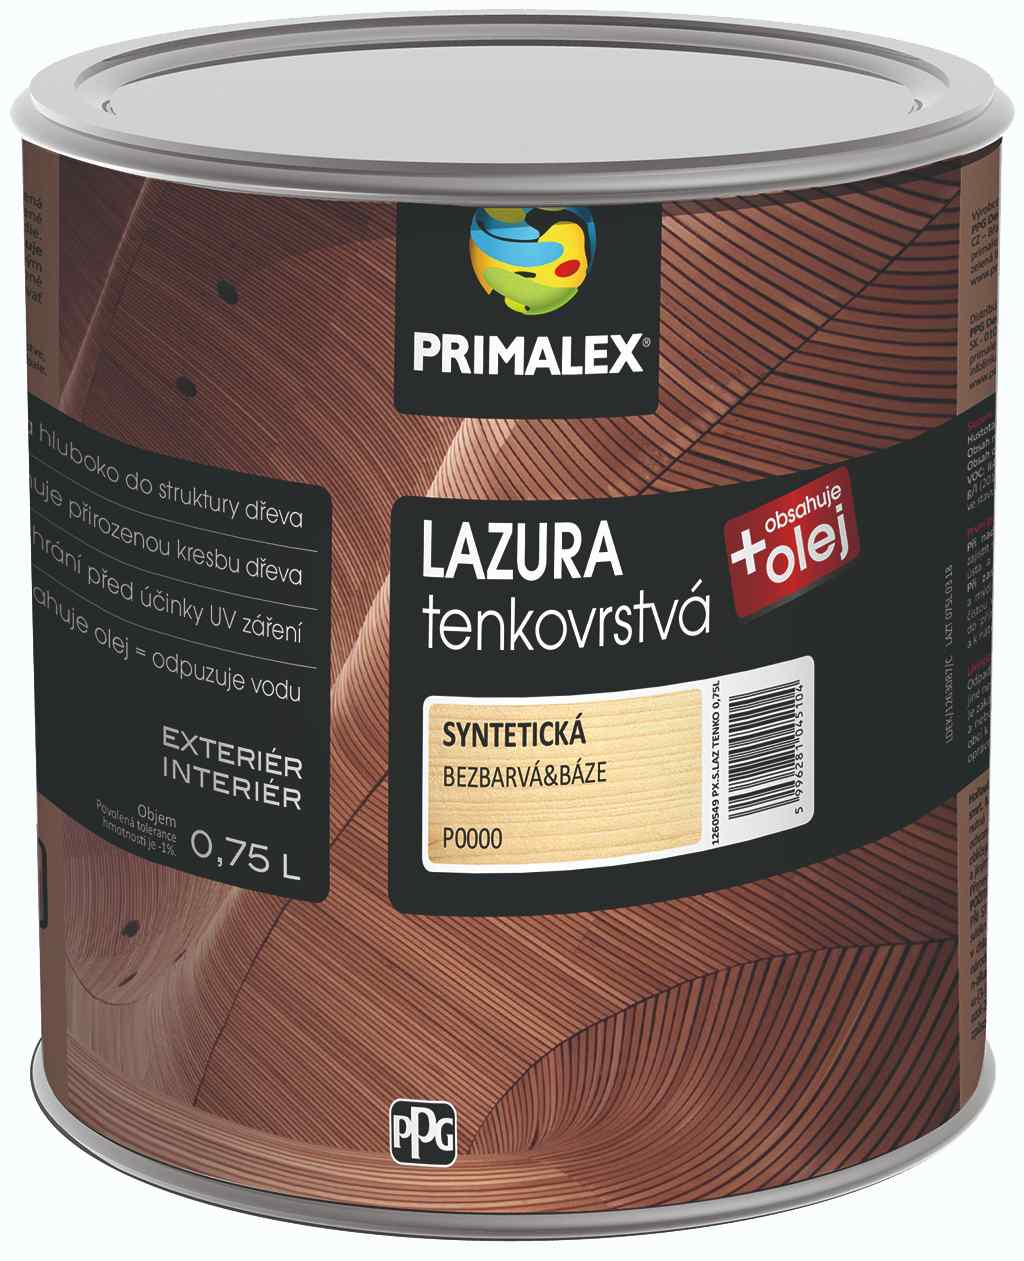 Primalex lazura_tenkovrstva_0,75l